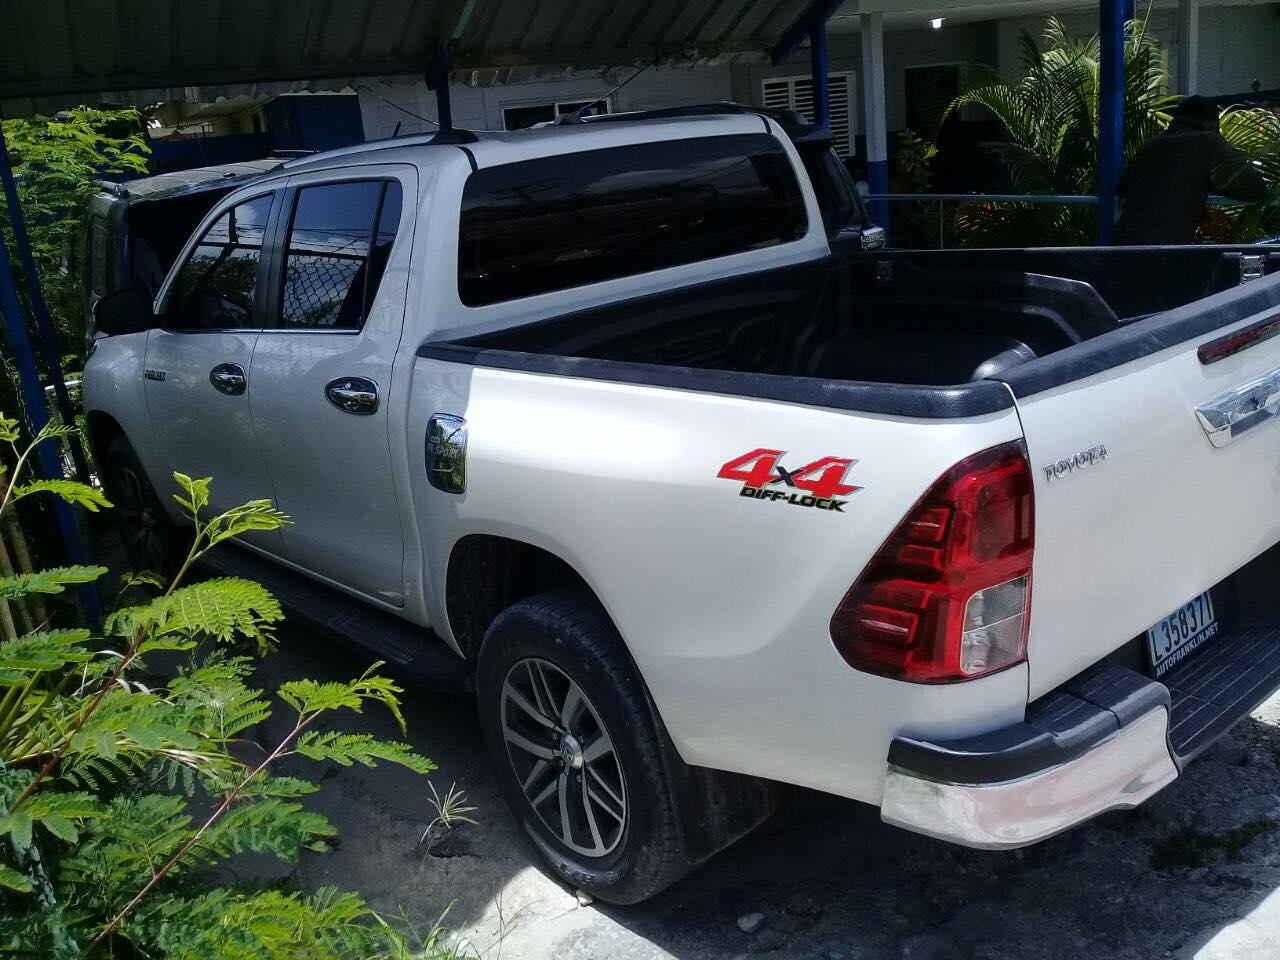 [Verón] Policía Nacional recupera camioneta Toyota HILUX Color Blanco robada en SD.